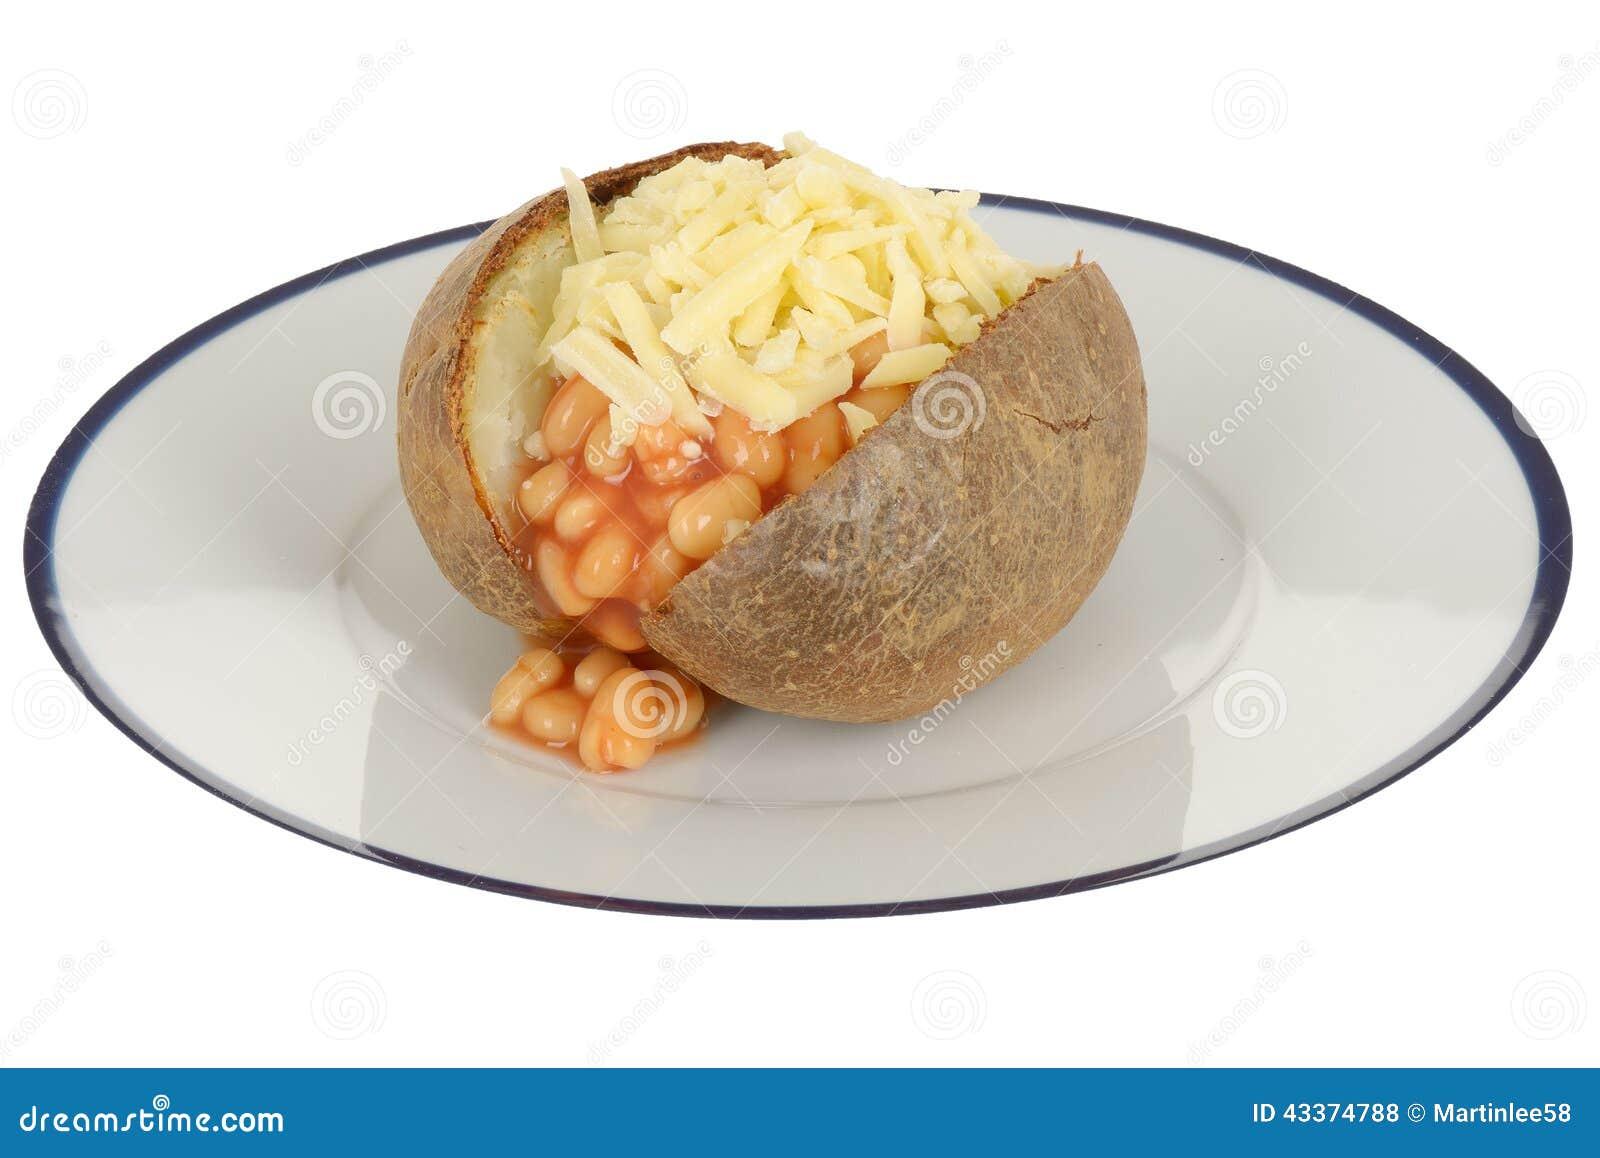 Baked Beans And Cheese Jacket Potato Stock Photo Image Of Potato